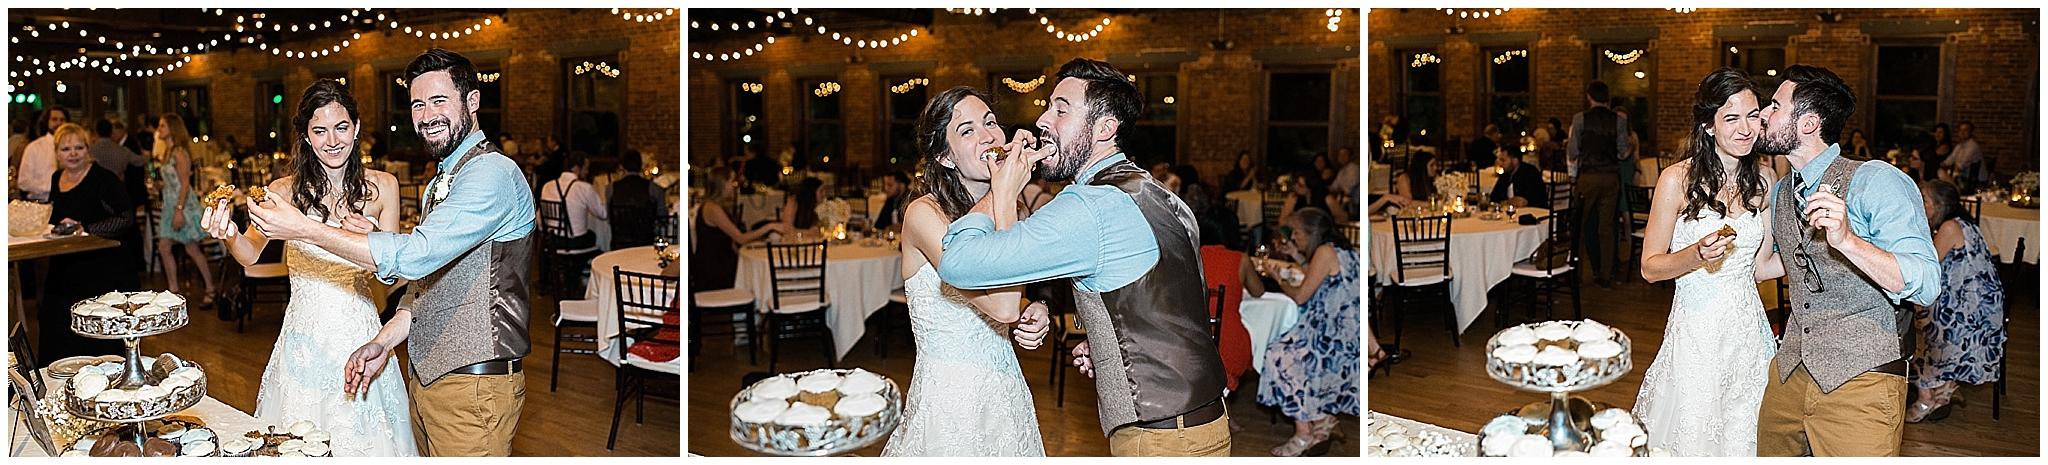 Wedding_Asheville_Century_Room_21.jpg